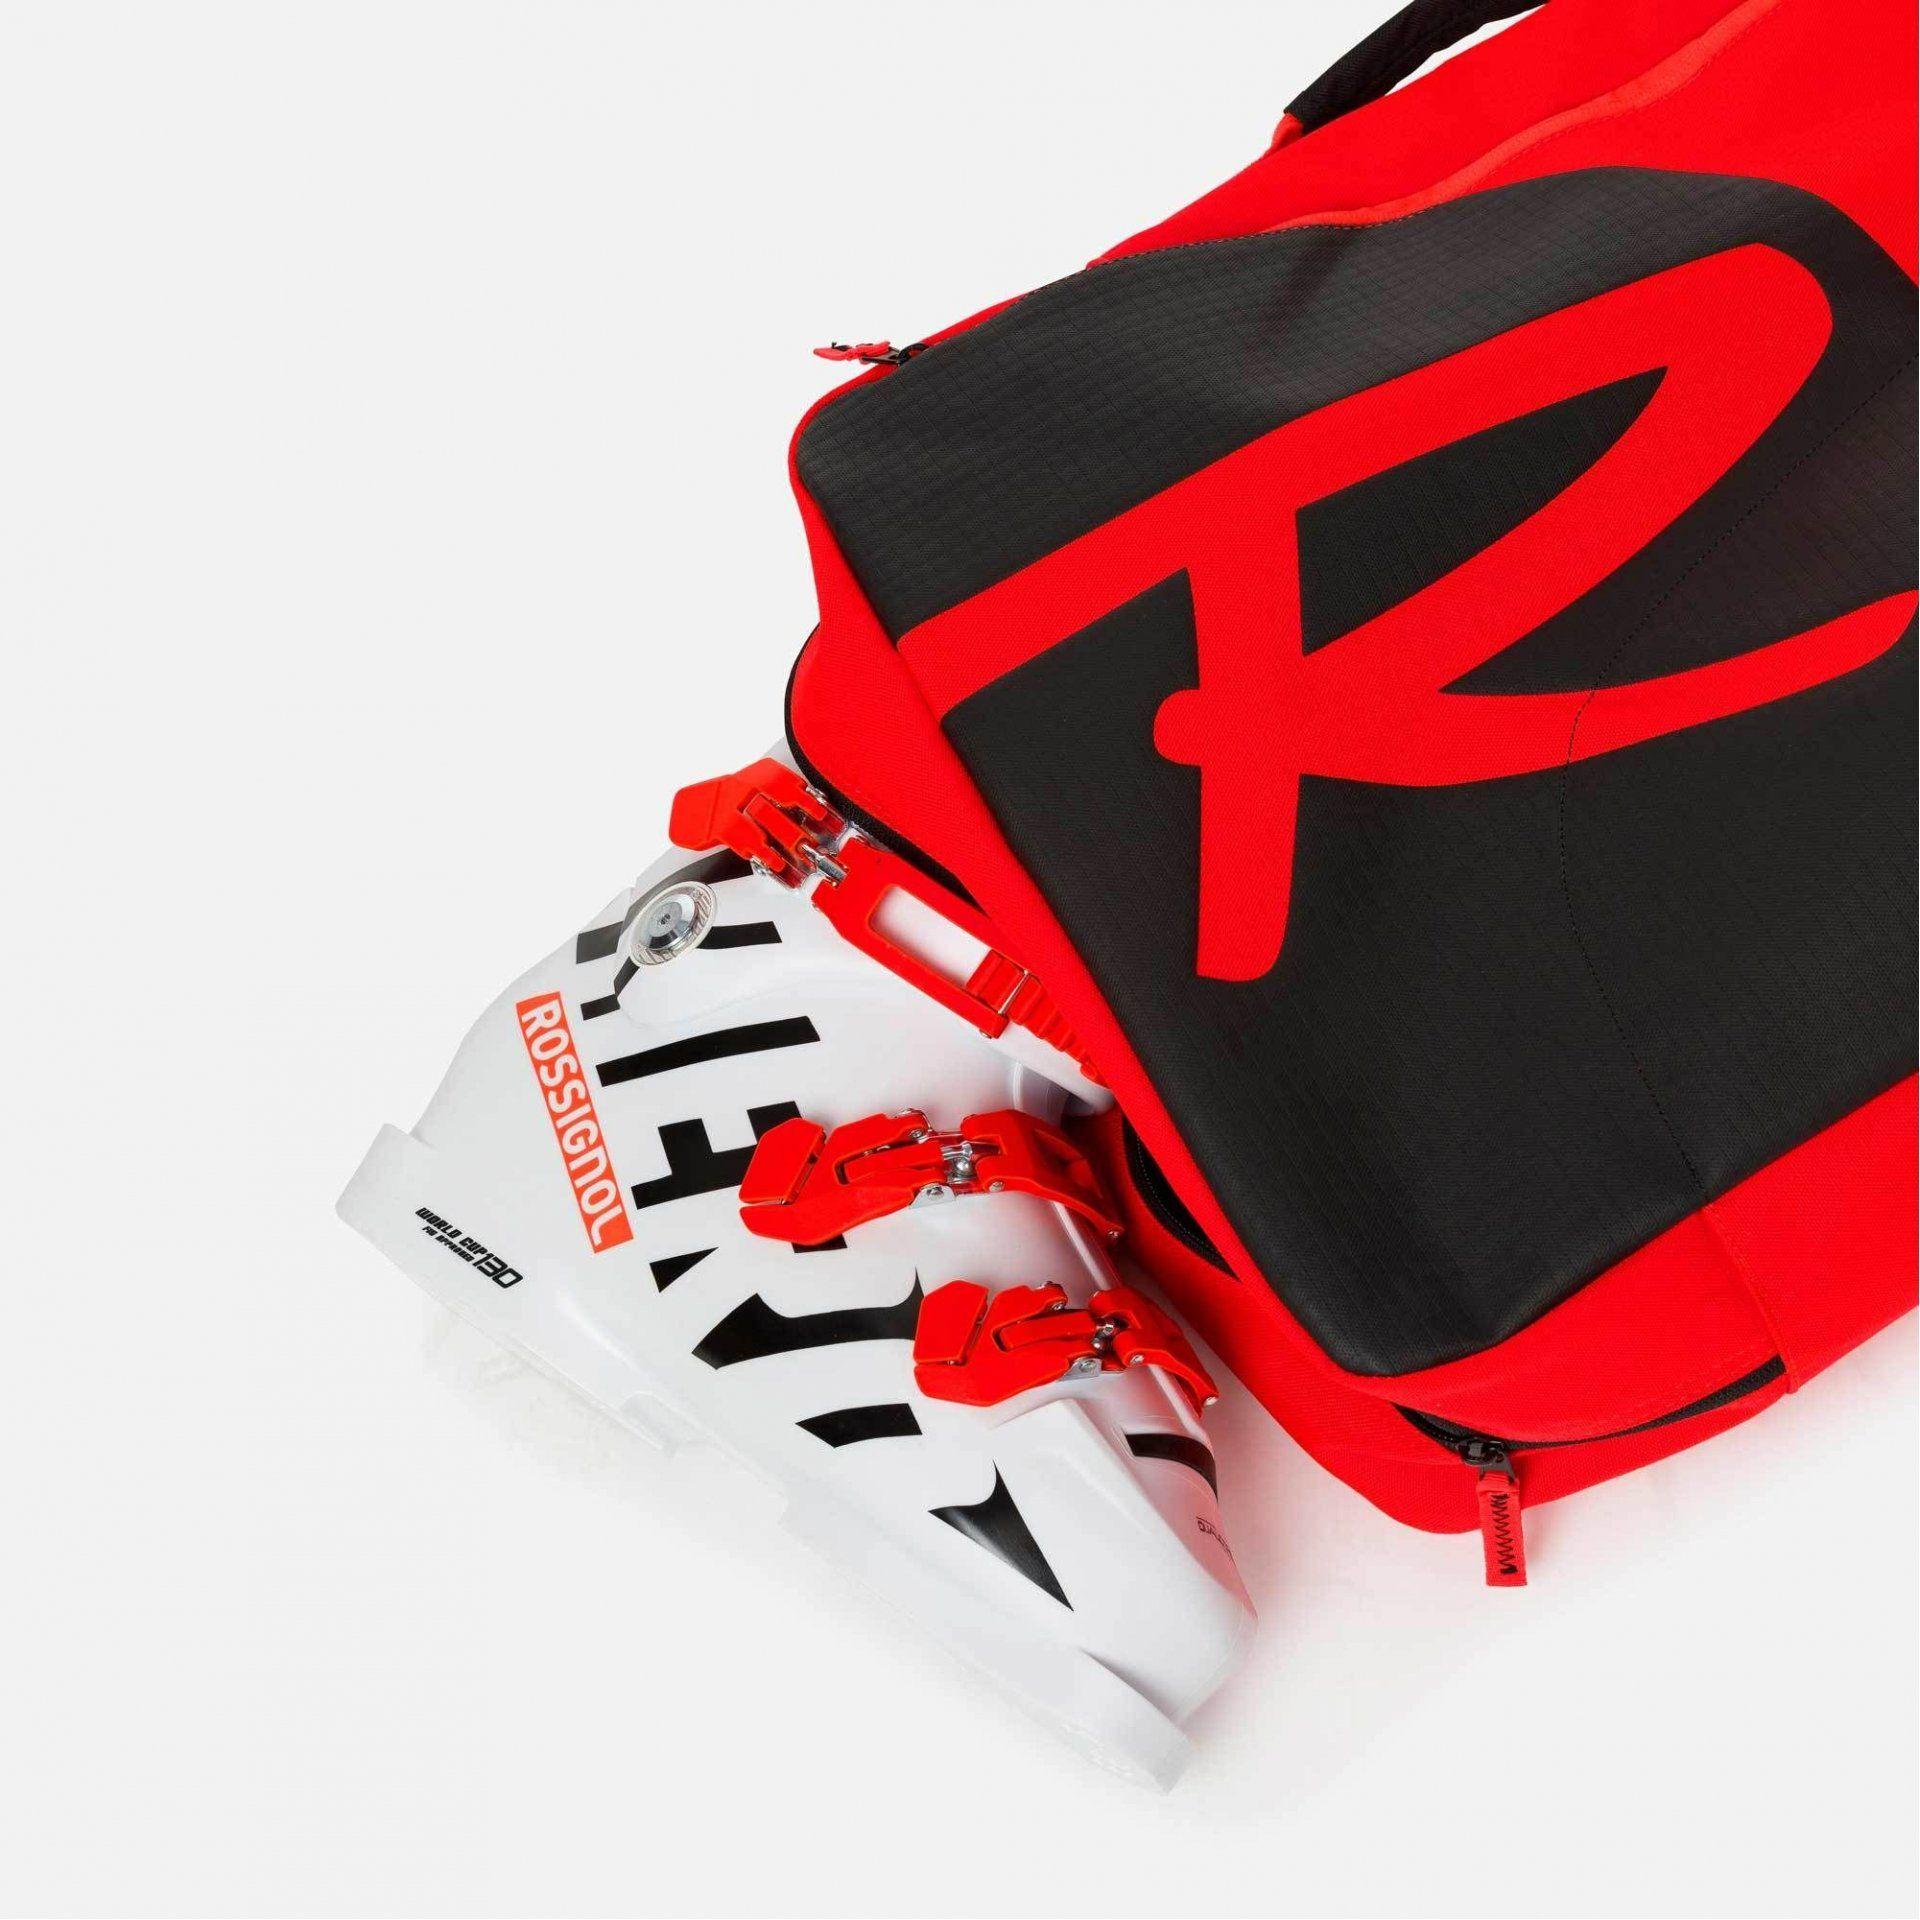 TORBA NA BUTY ROSSIGNOL HERO DUAL BOOT BAG RKHB108 2